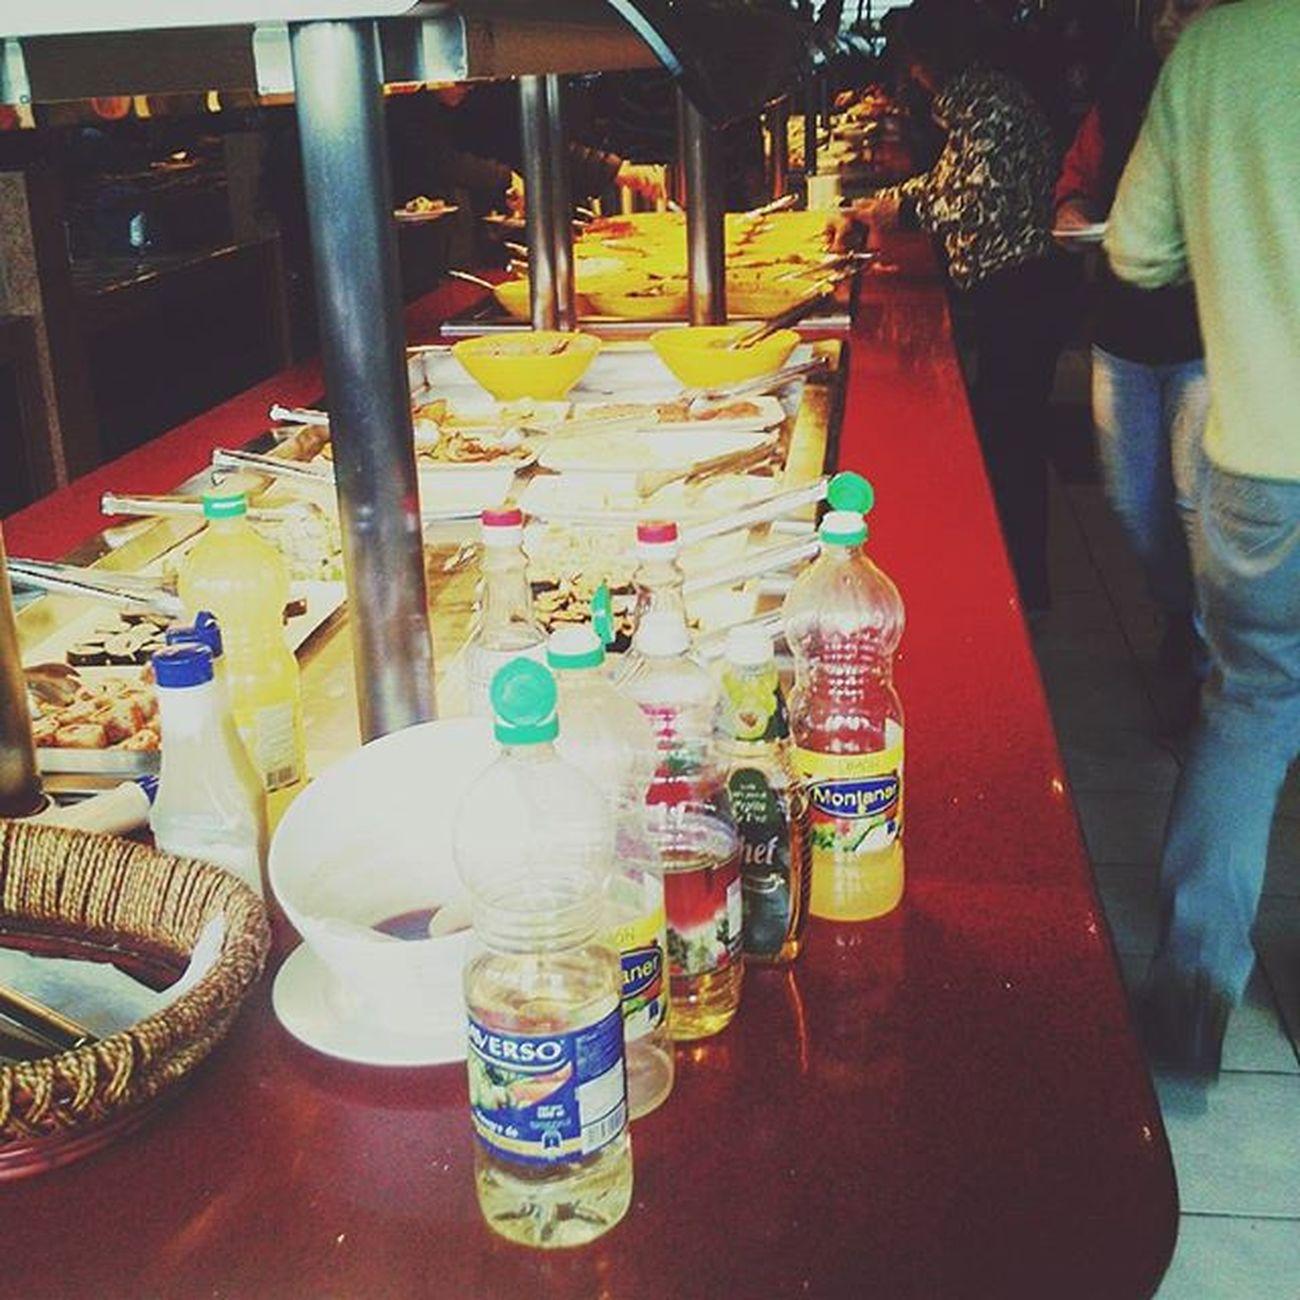 Muchacomida Gordito Dieta Instamoments Instalike Instagram Temuco Tenedorlibre Instadaily Instamood